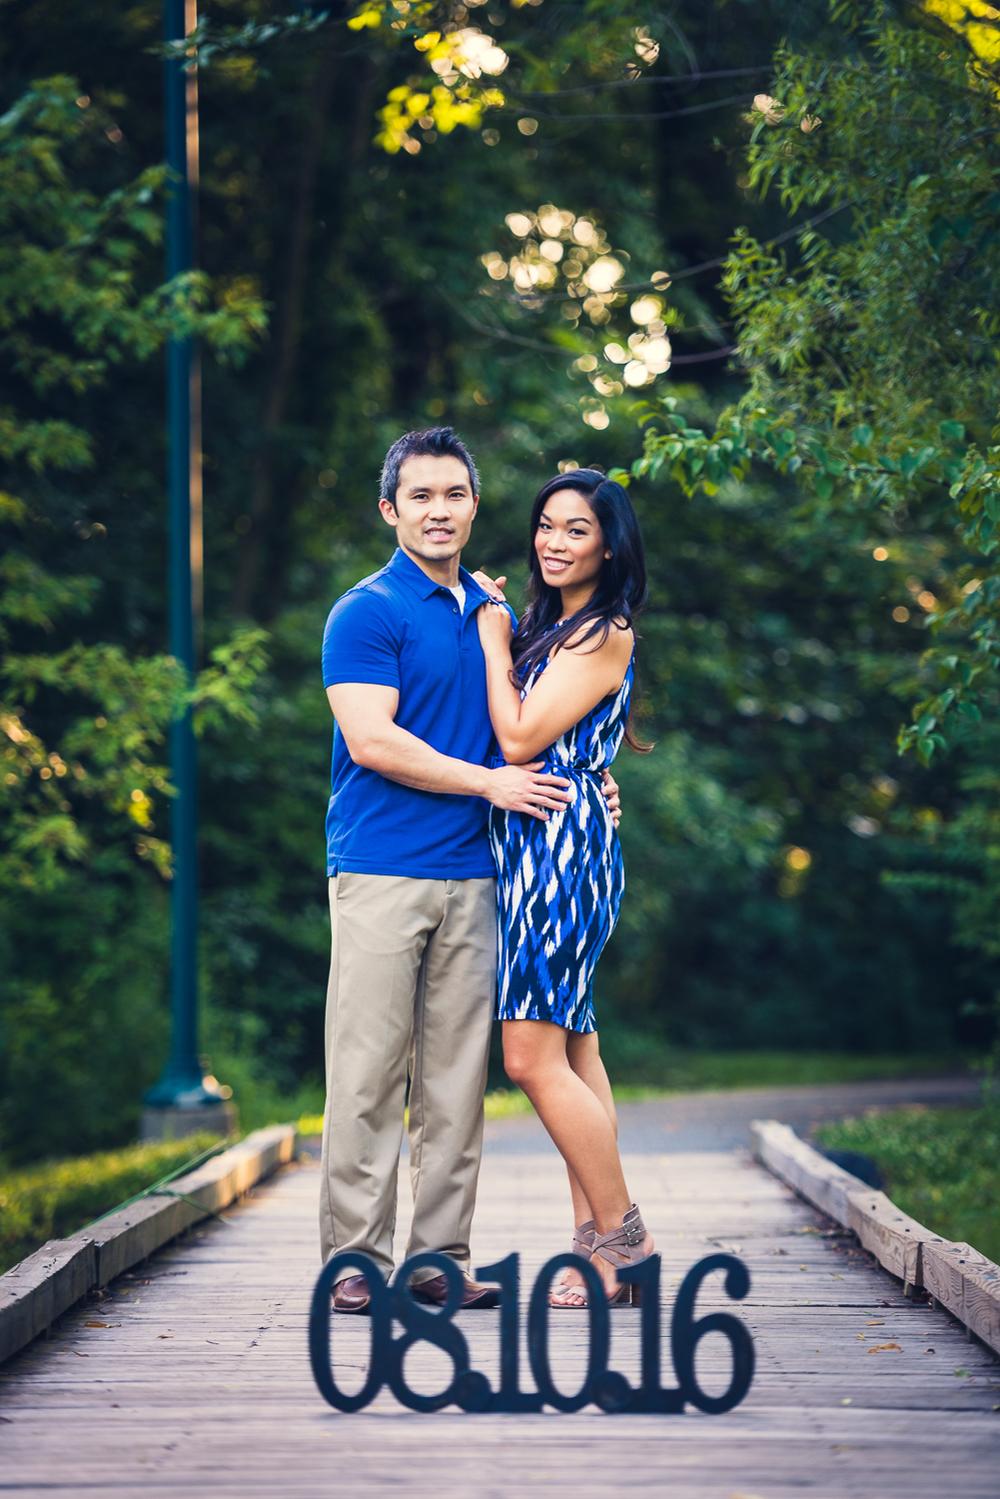 20160705 - Justine Wu Engagement Pix LR-1.jpg